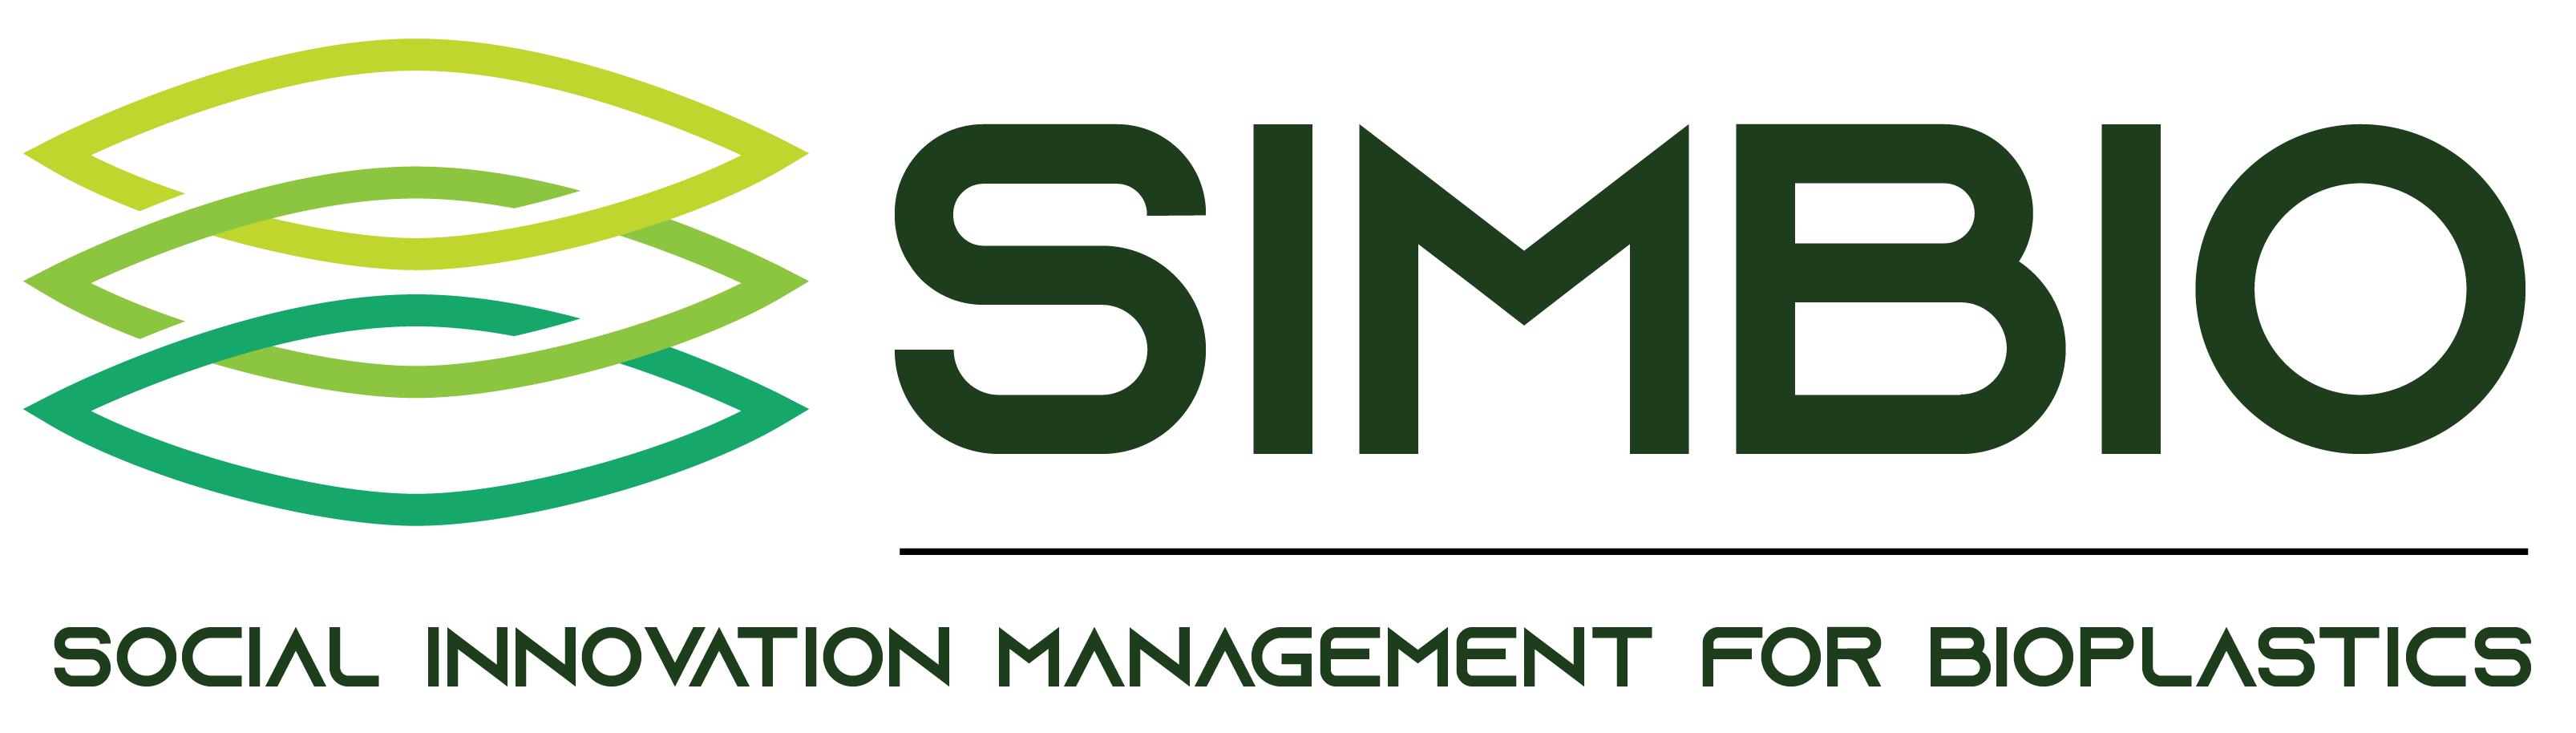 SIMBIO Research